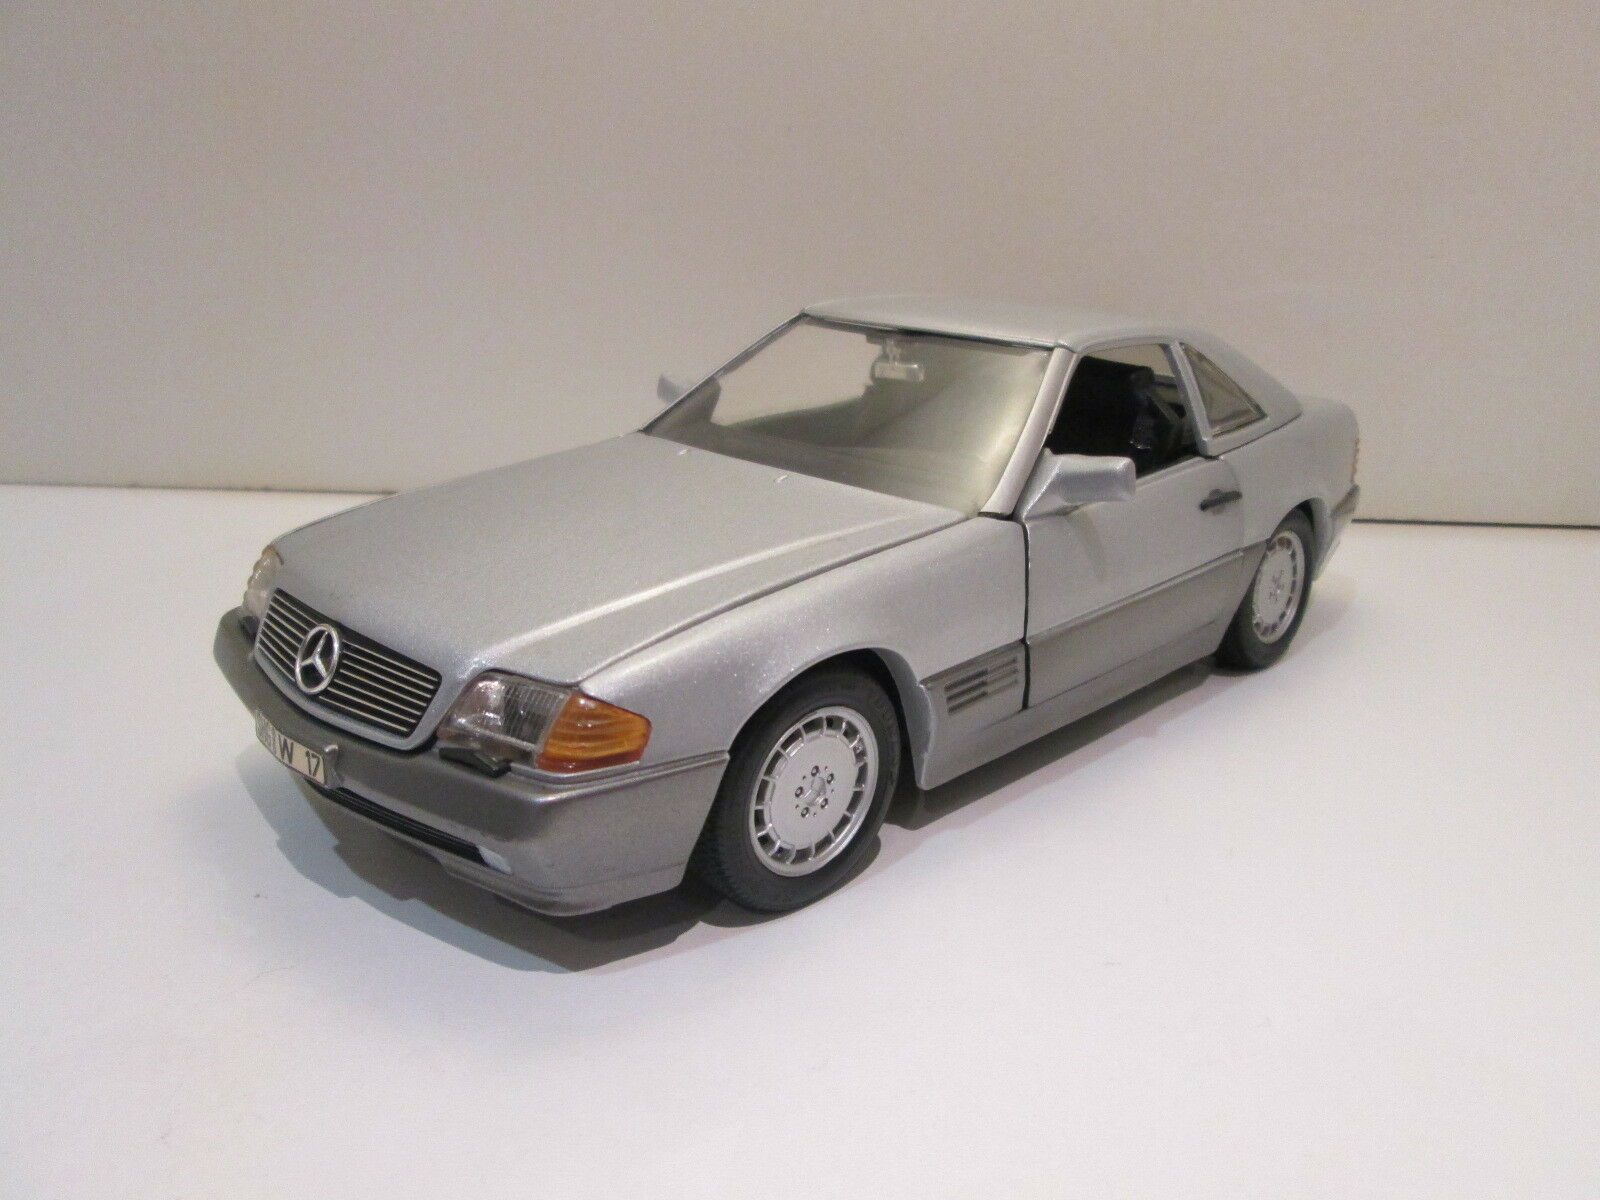 1 18 Mercedes-Benz SL500 R129 de 1993 - Revell Revell Revell - Improved (leather seats,...) 18b487